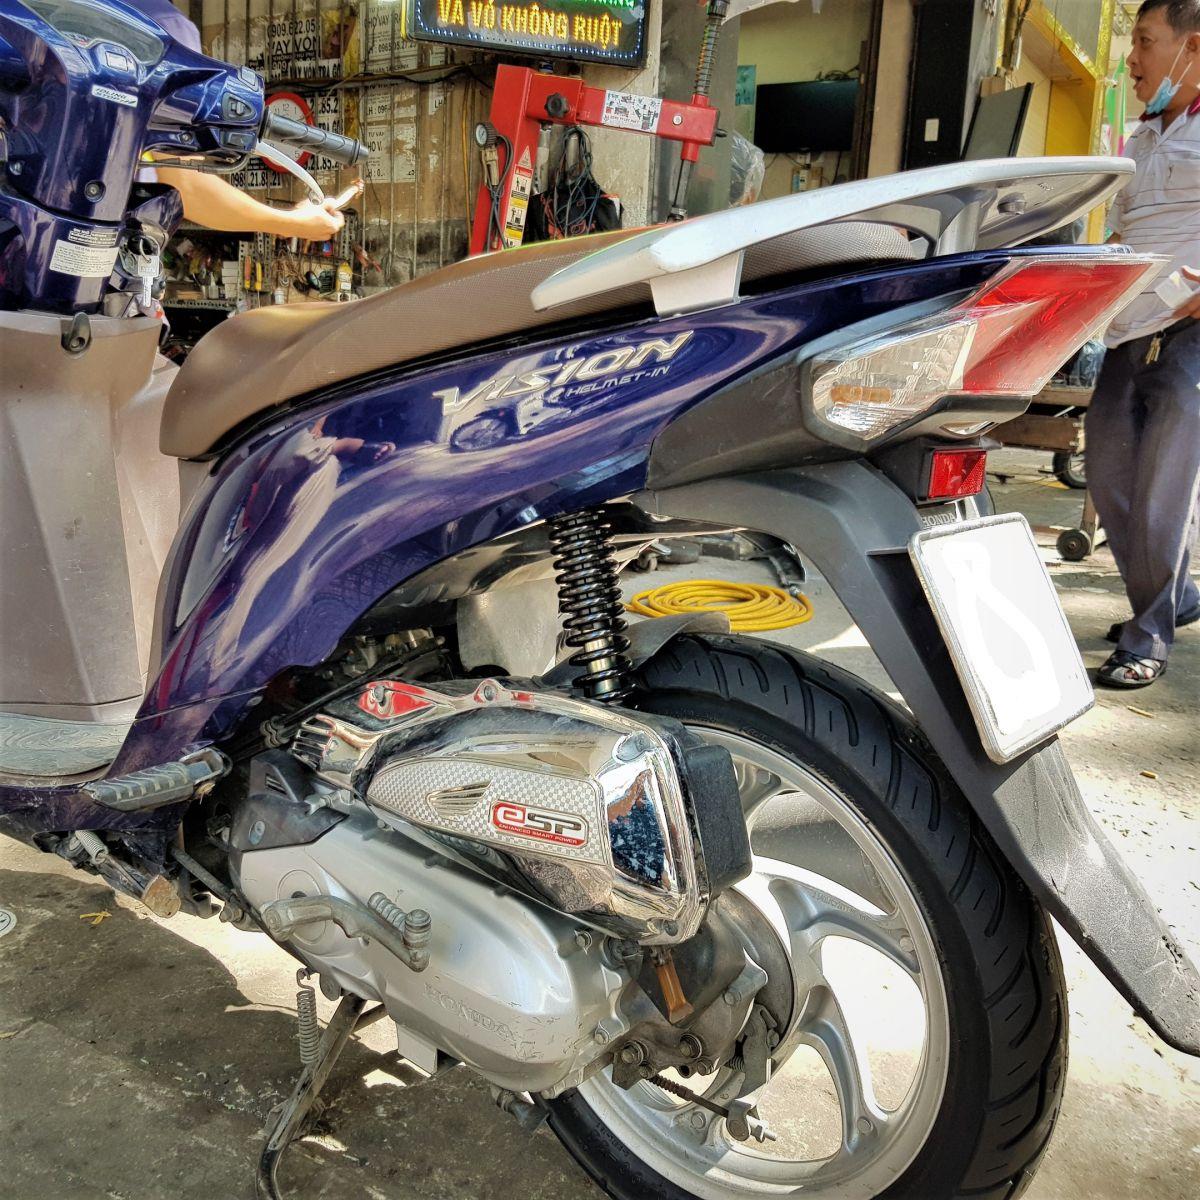 Phuoc-sau-Vision-chinh-hang-Honda-10b